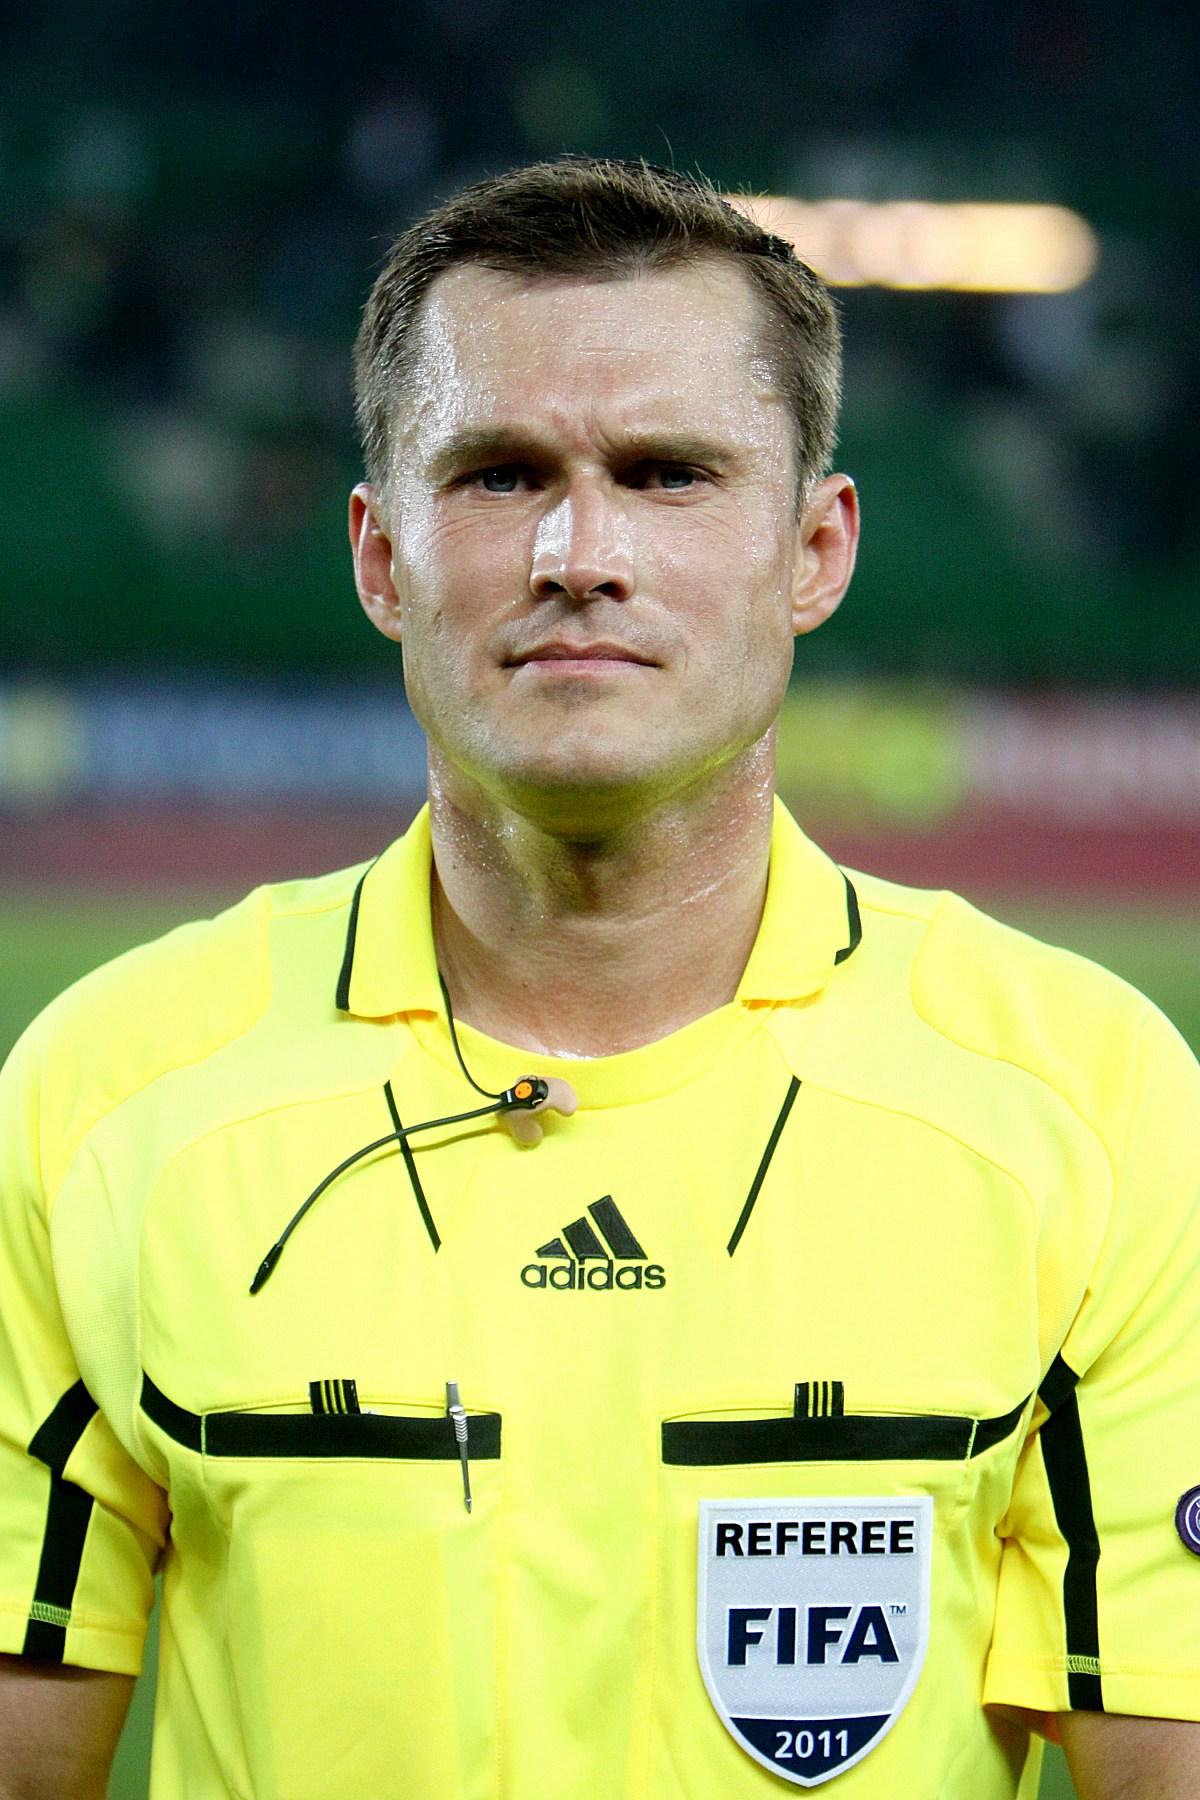 Fifa referee rule soccer ea sports fifa france on facebook